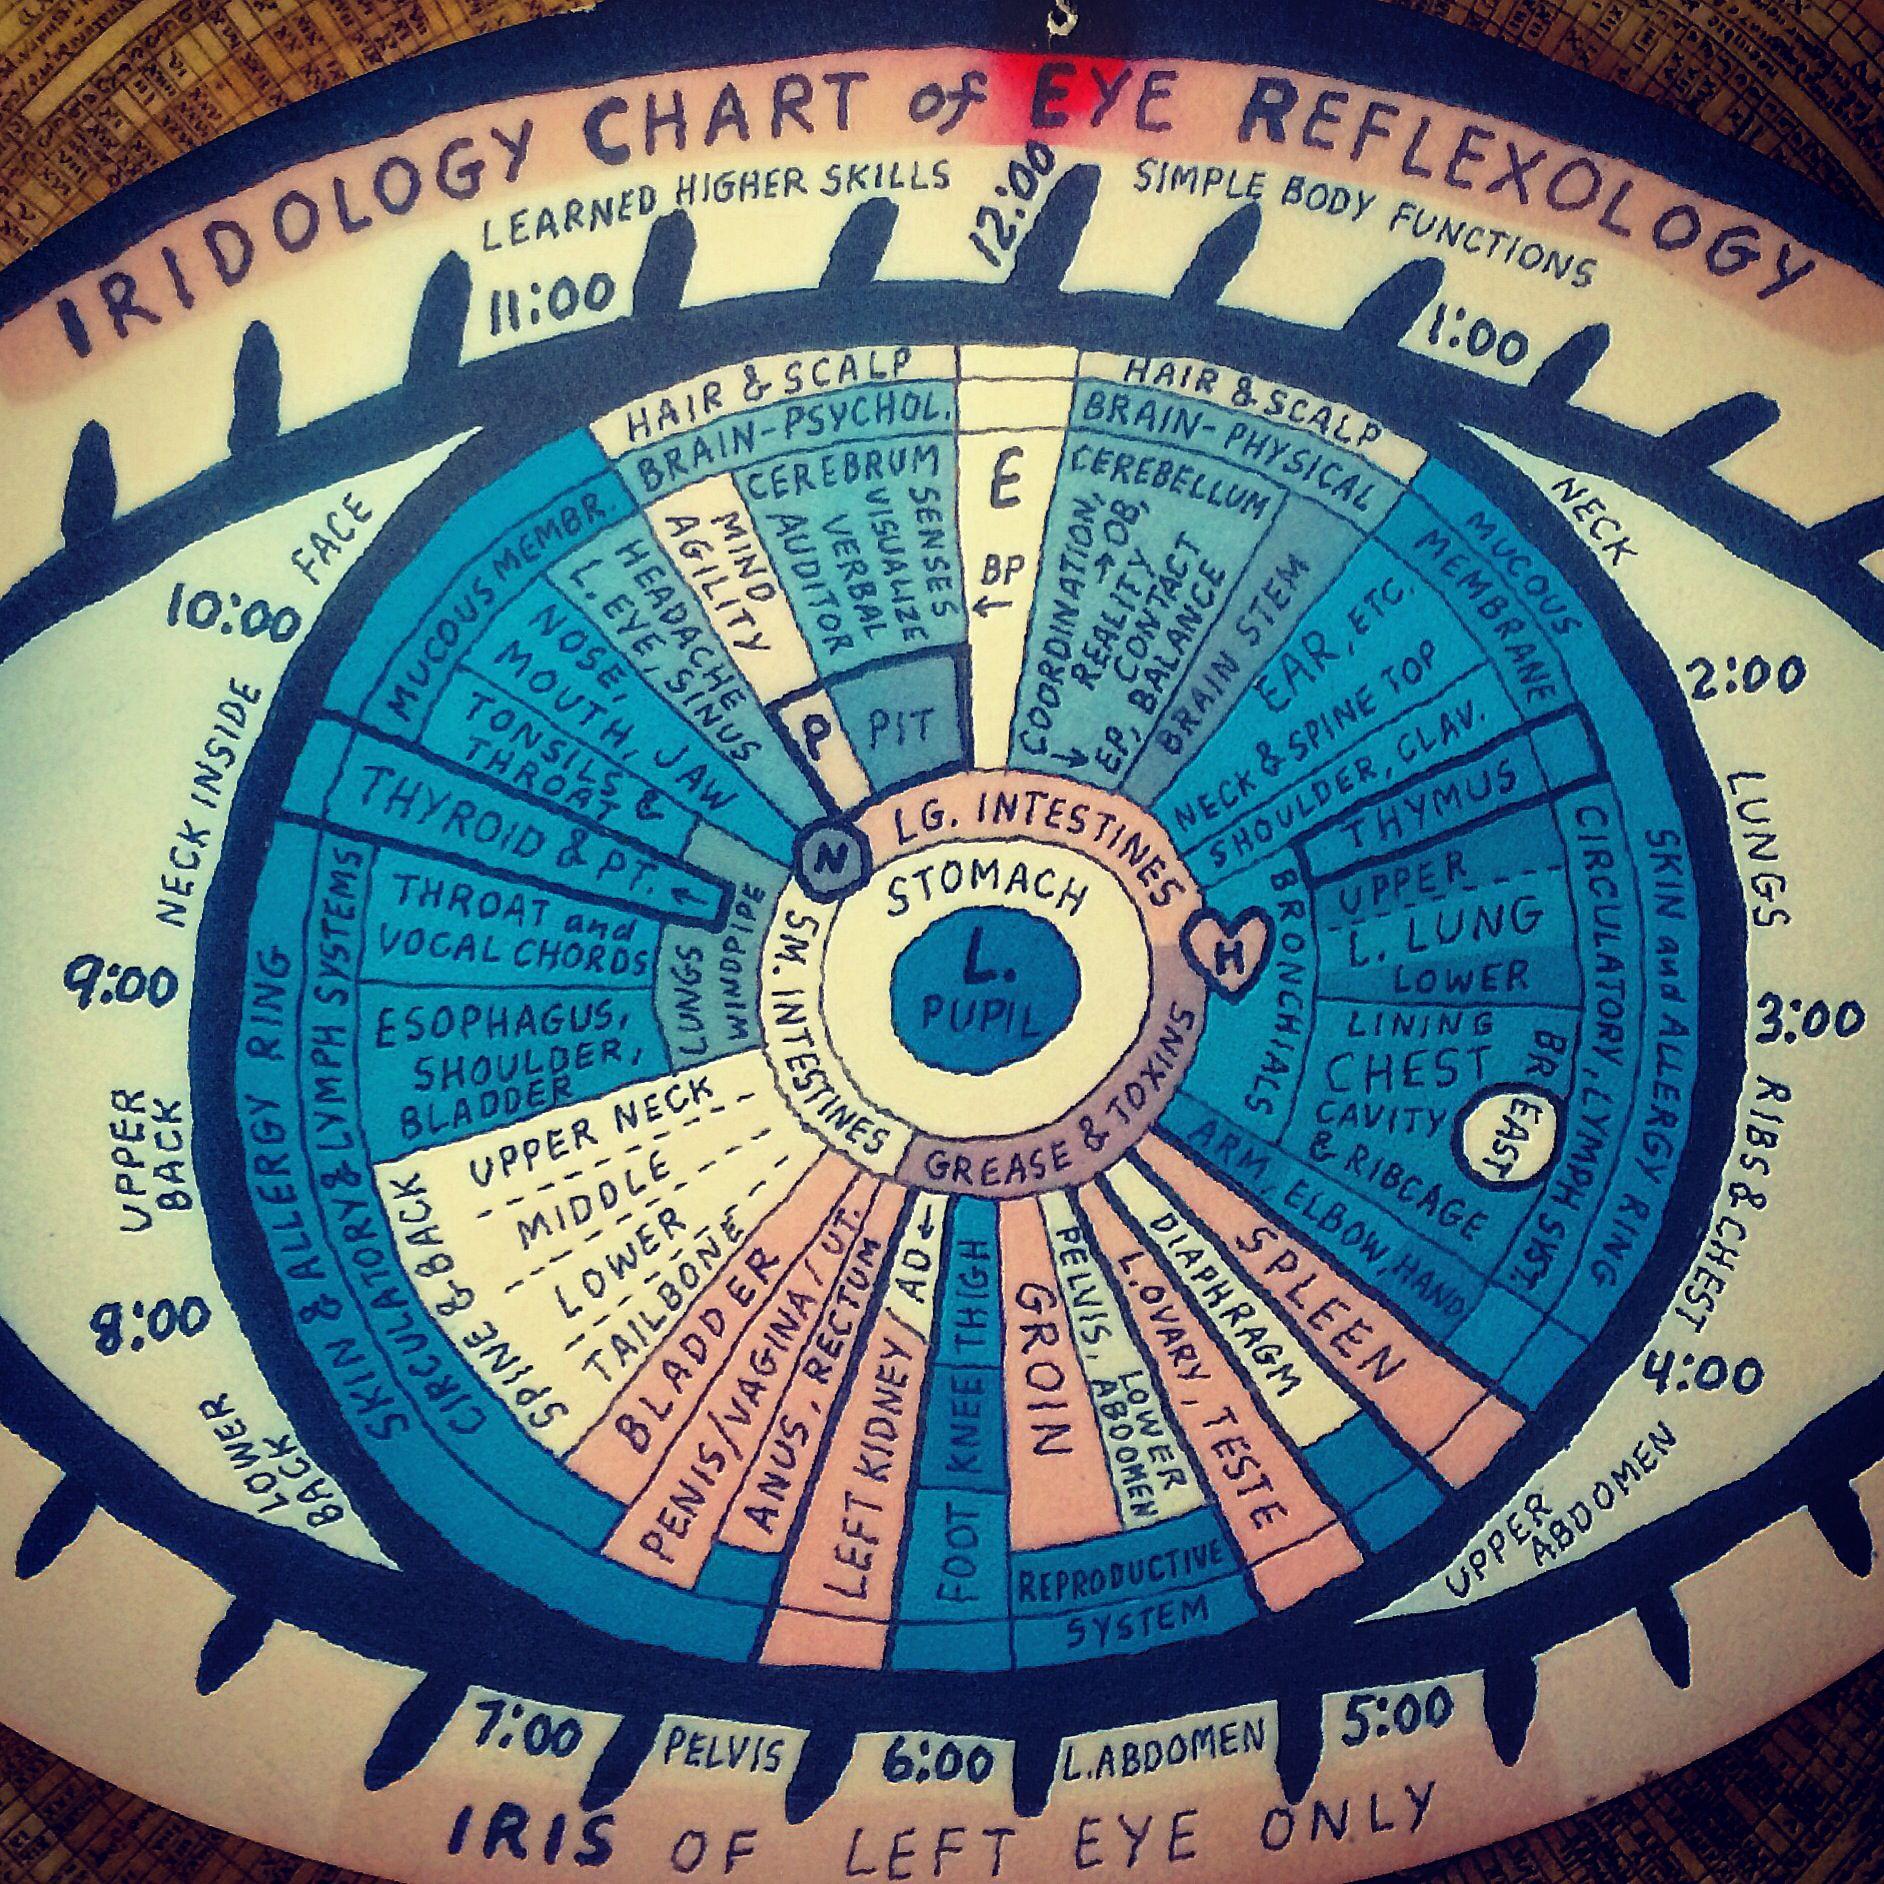 Iridology chart of eye reflexology irydology pinterest iridology chart of eye reflexology geenschuldenfo Gallery